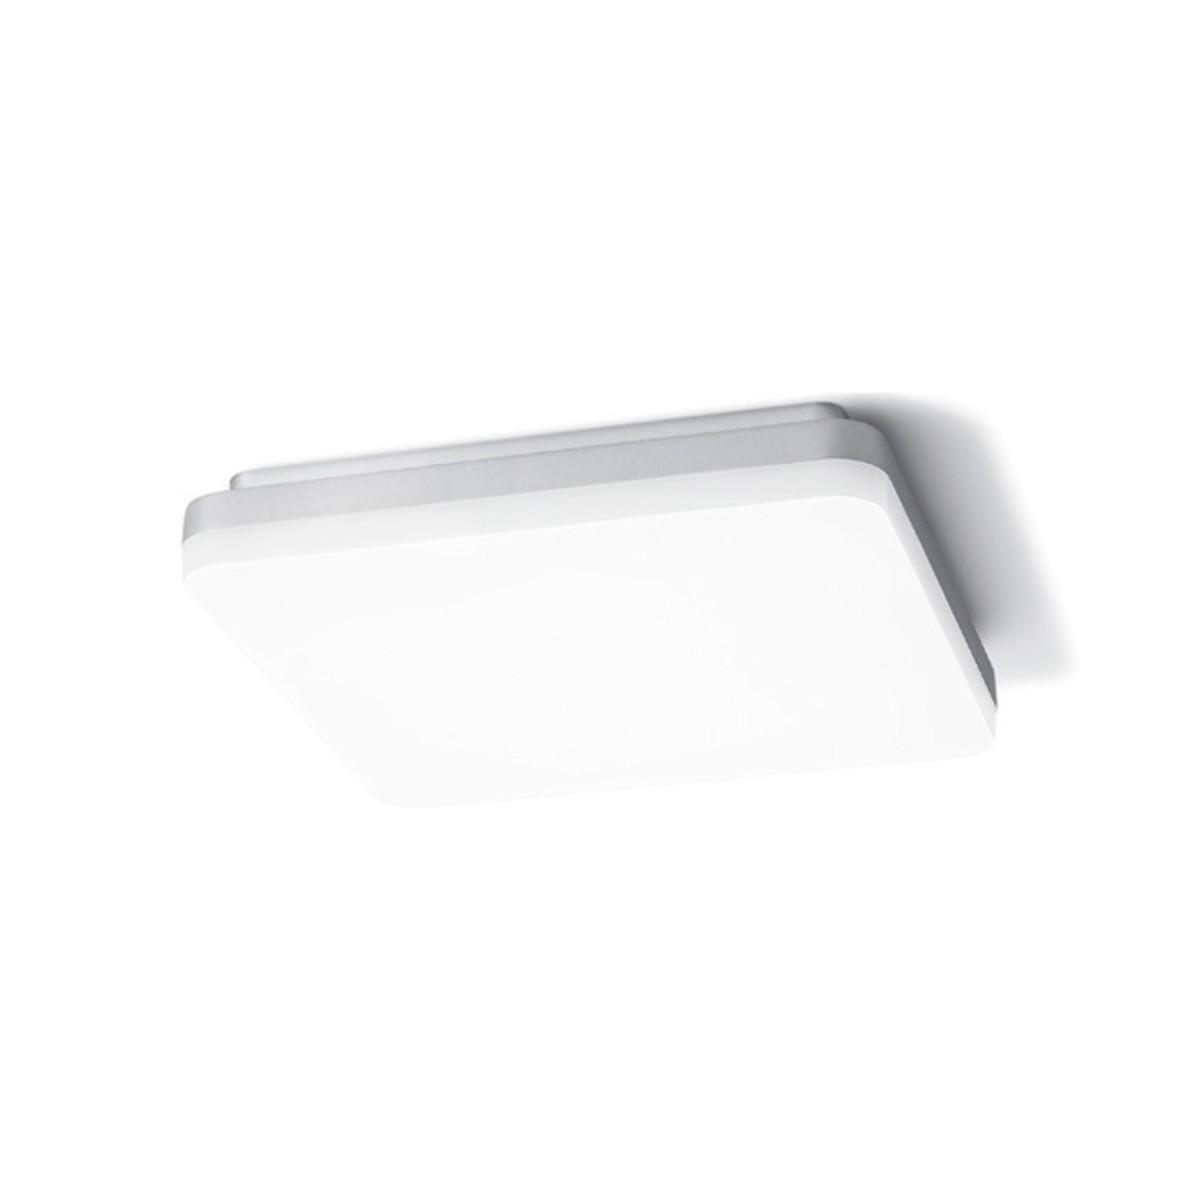 Sigor Square LED Deckenleuchte, 4000 K, 26 x 26 cm, Silber